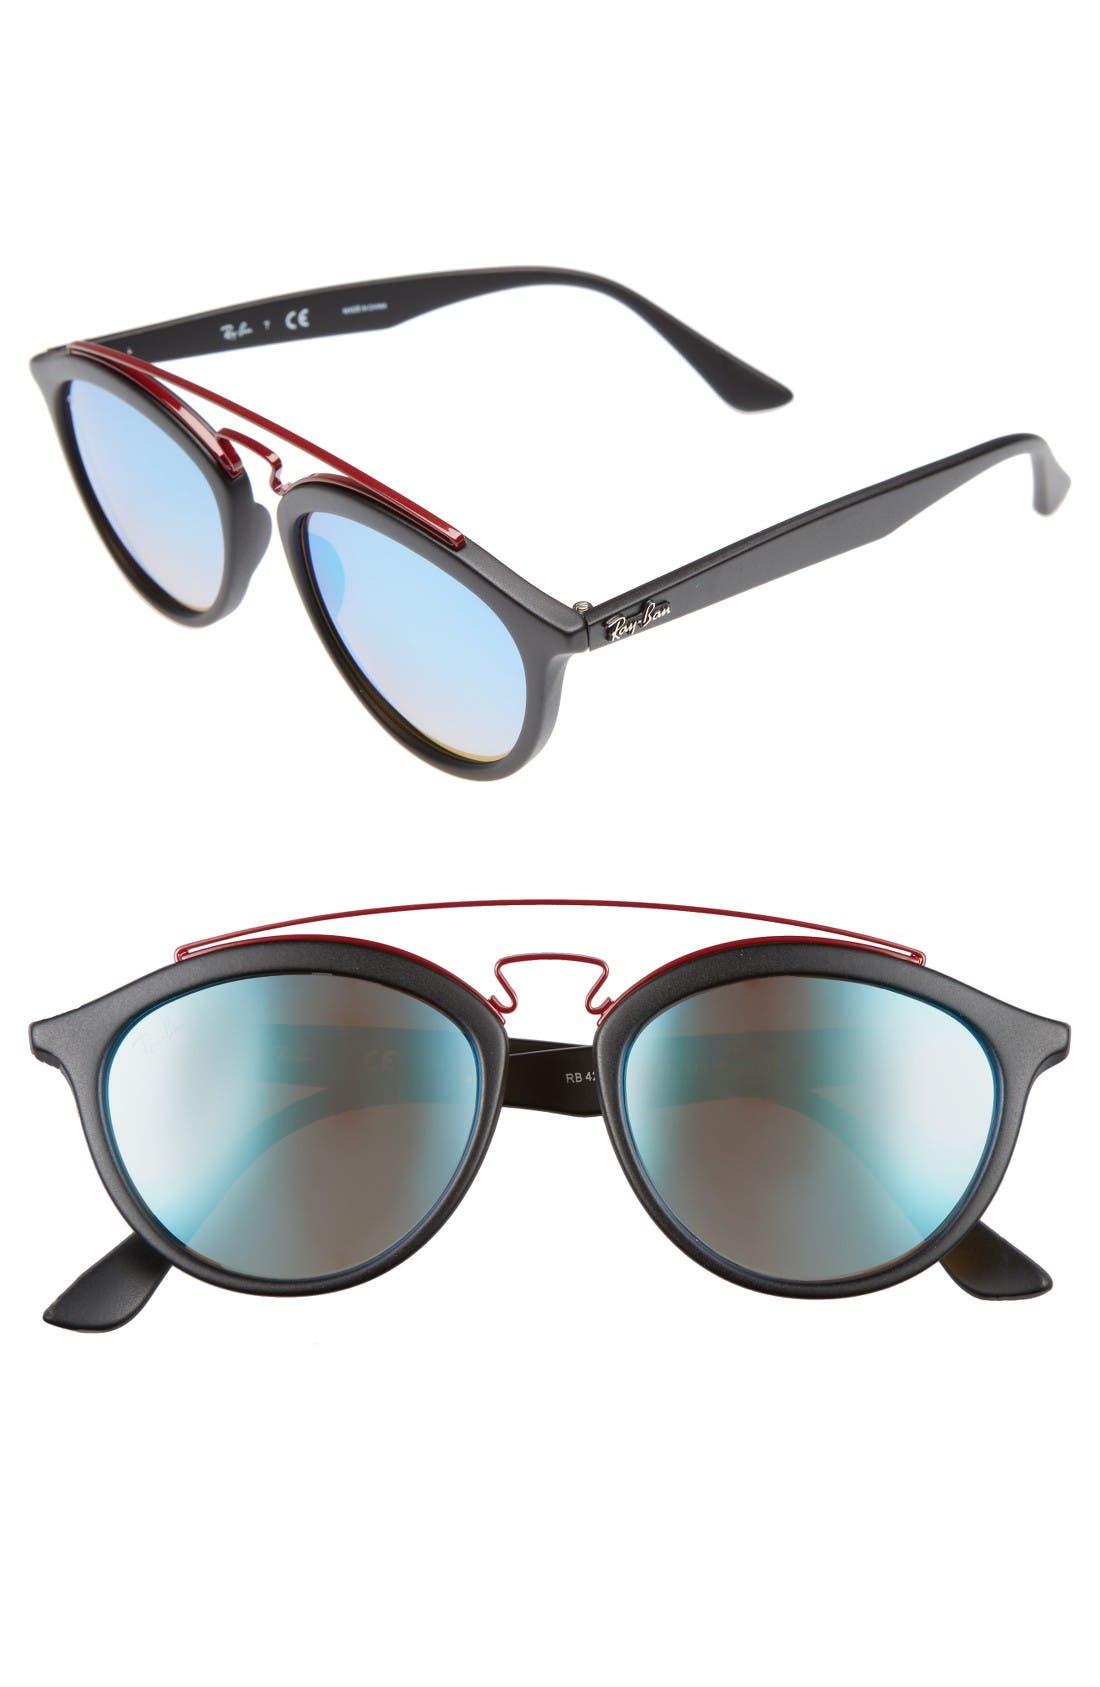 Icons 53mm Retro Sunglasses,                         Main,                         color, Black/ Blue